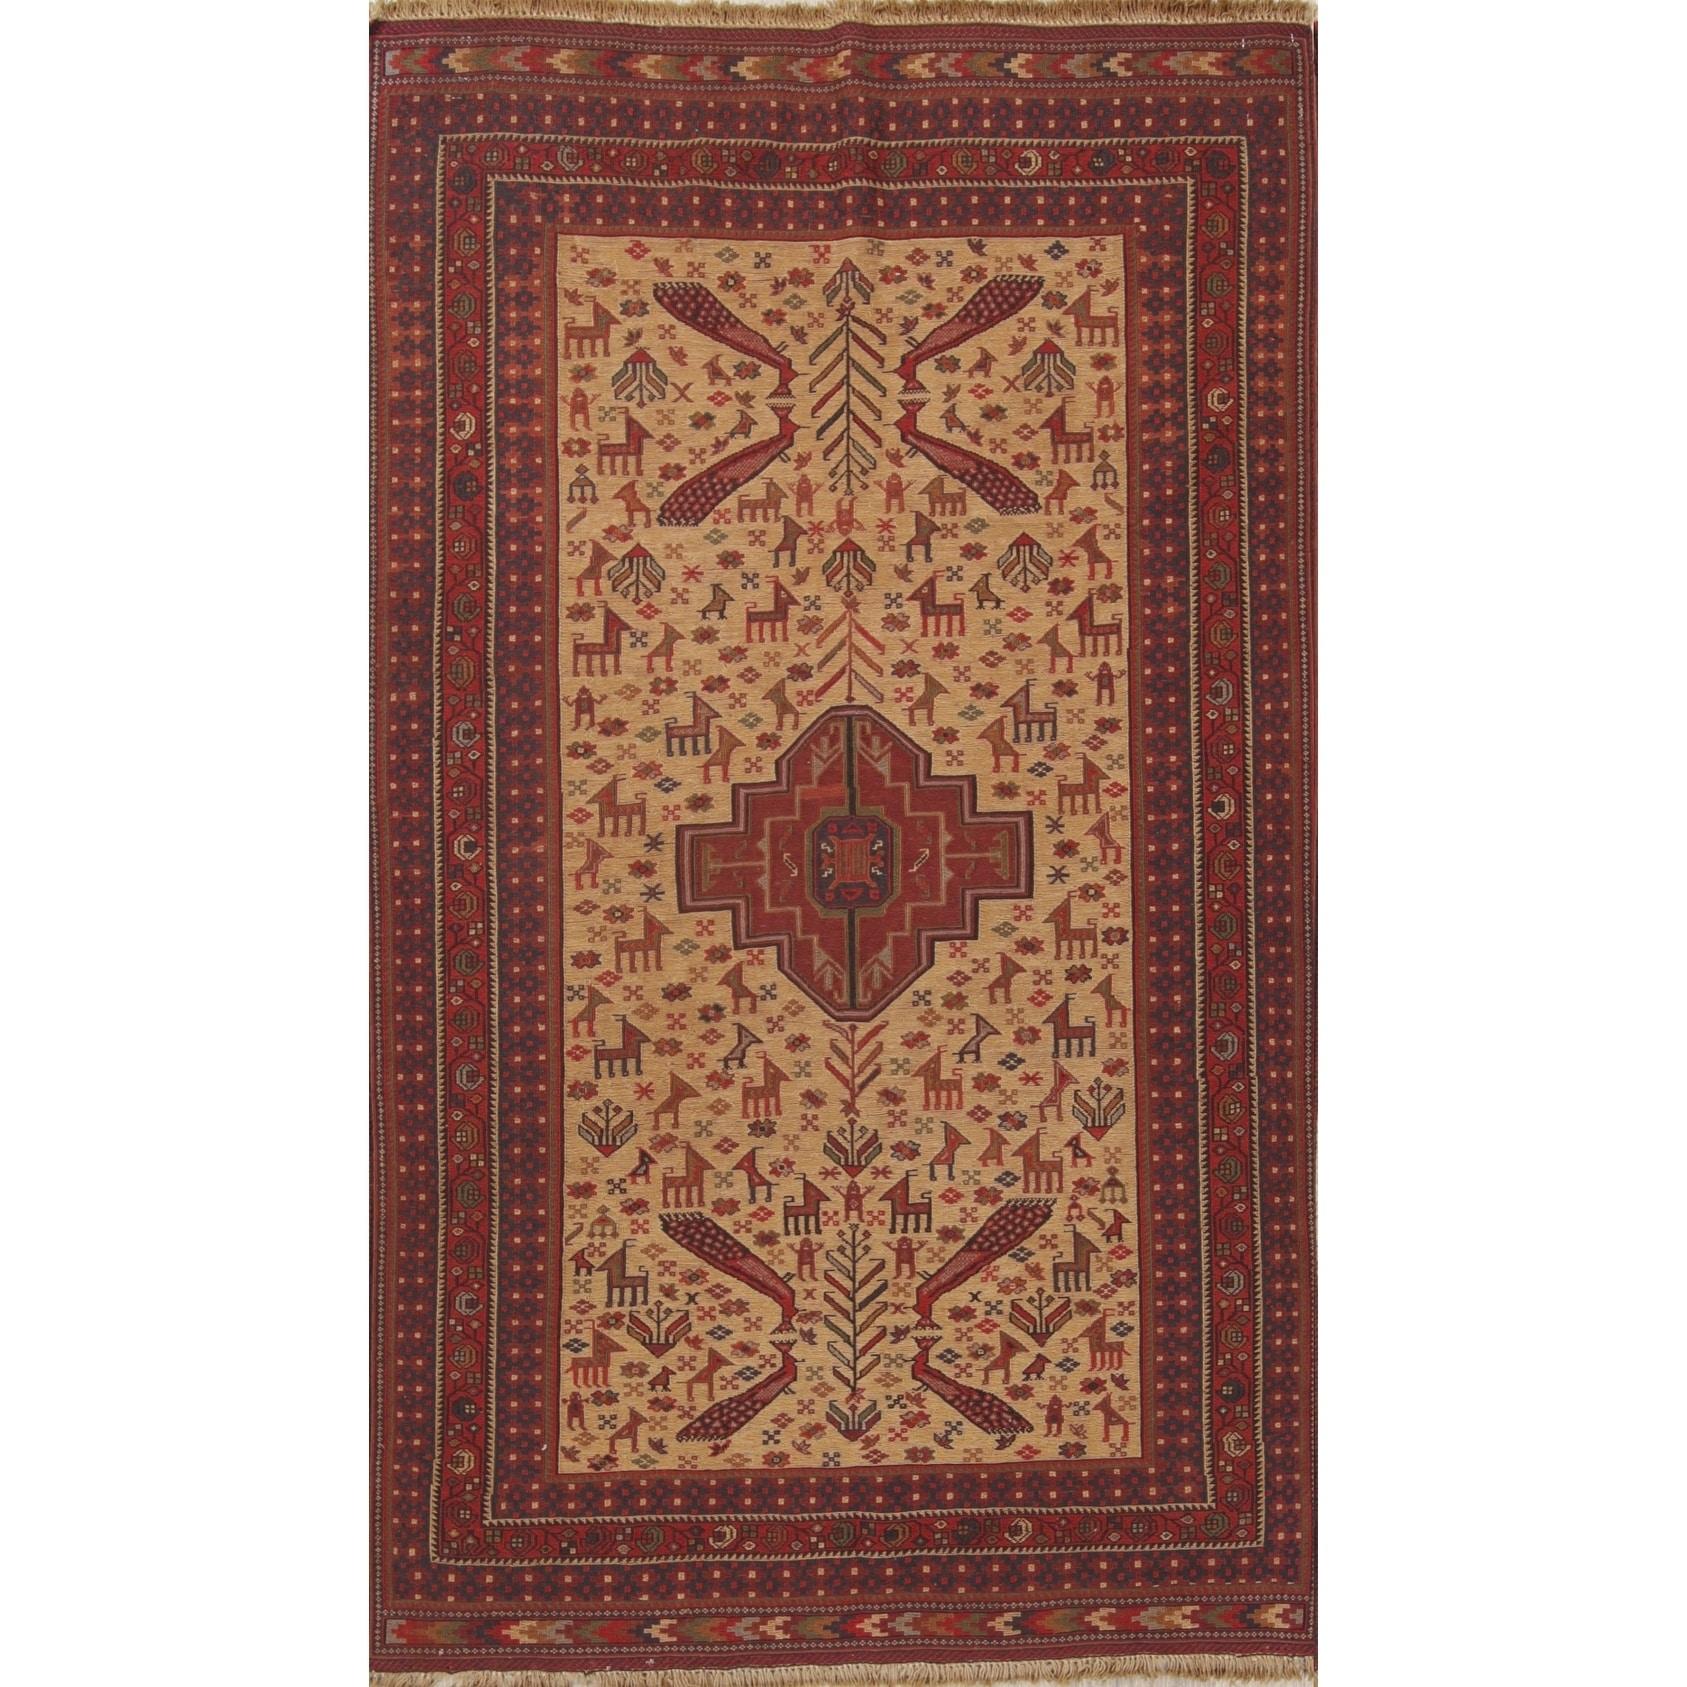 Vintage Sumak Animal Pictorial Hand Woven Wool Persian Area Rug 6 9 X 3 11 On Sale Overstock 27384039